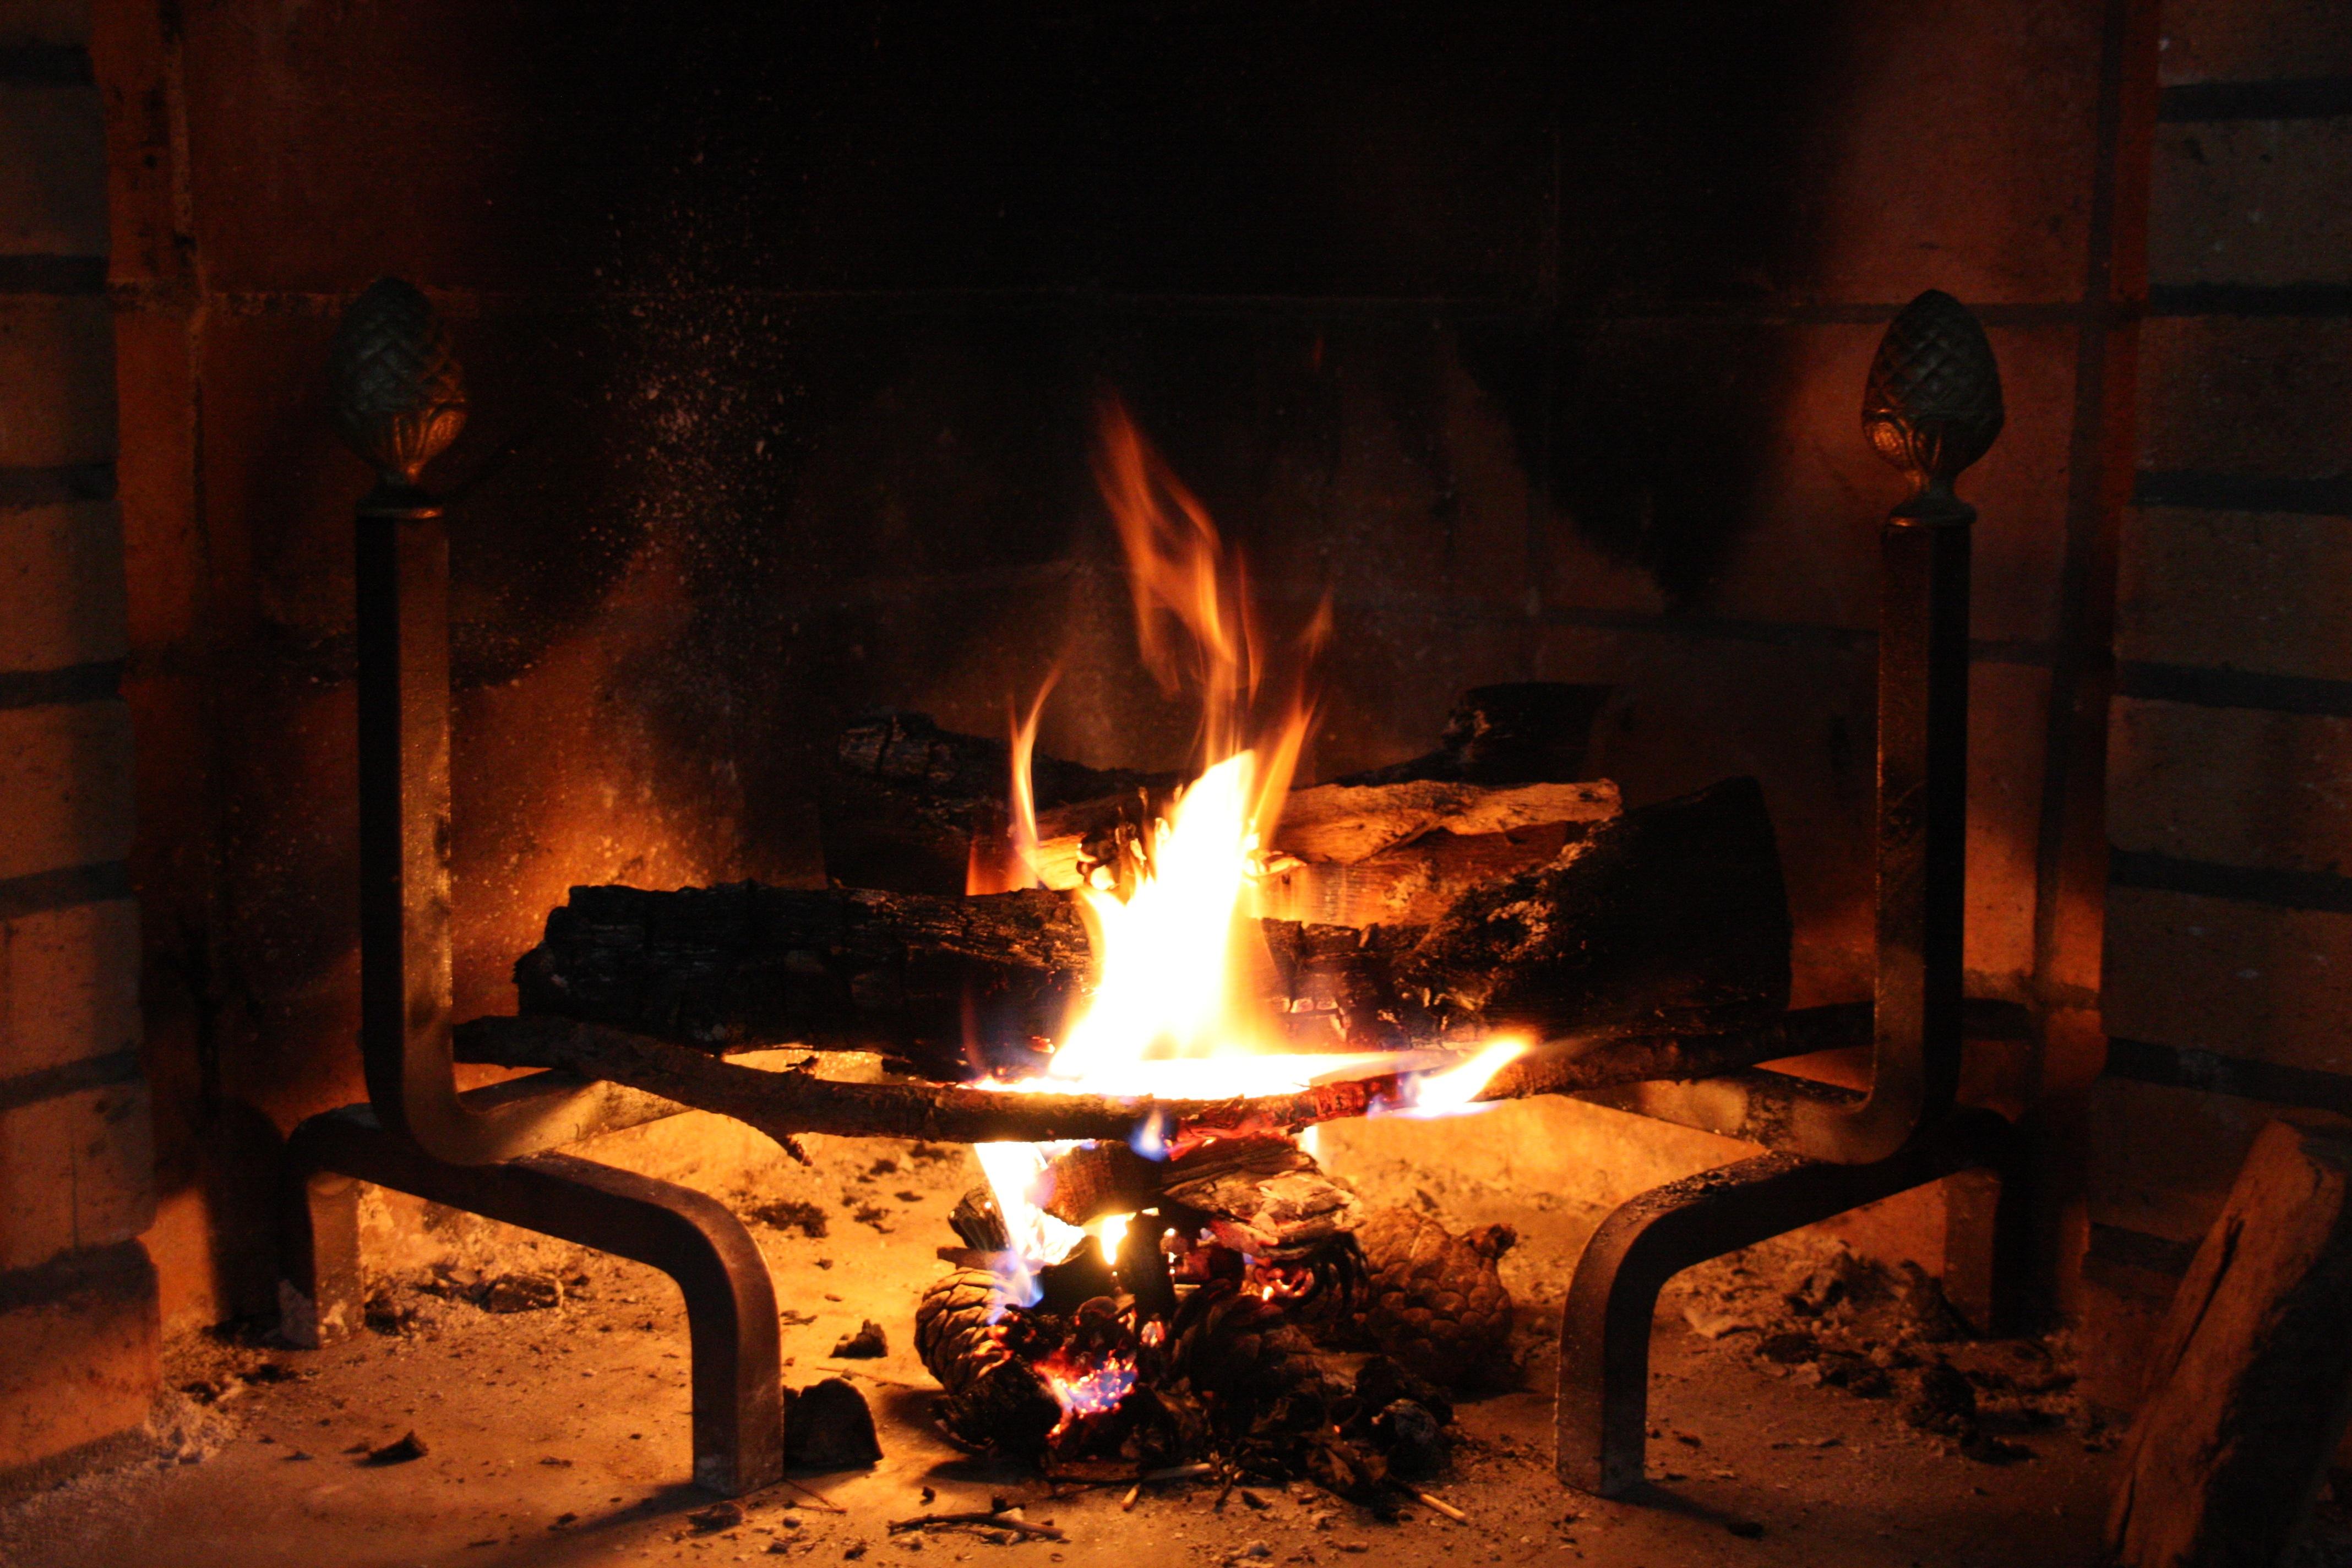 Fotos Gratis Fuego Chimenea Hoguera Caliente Cebar